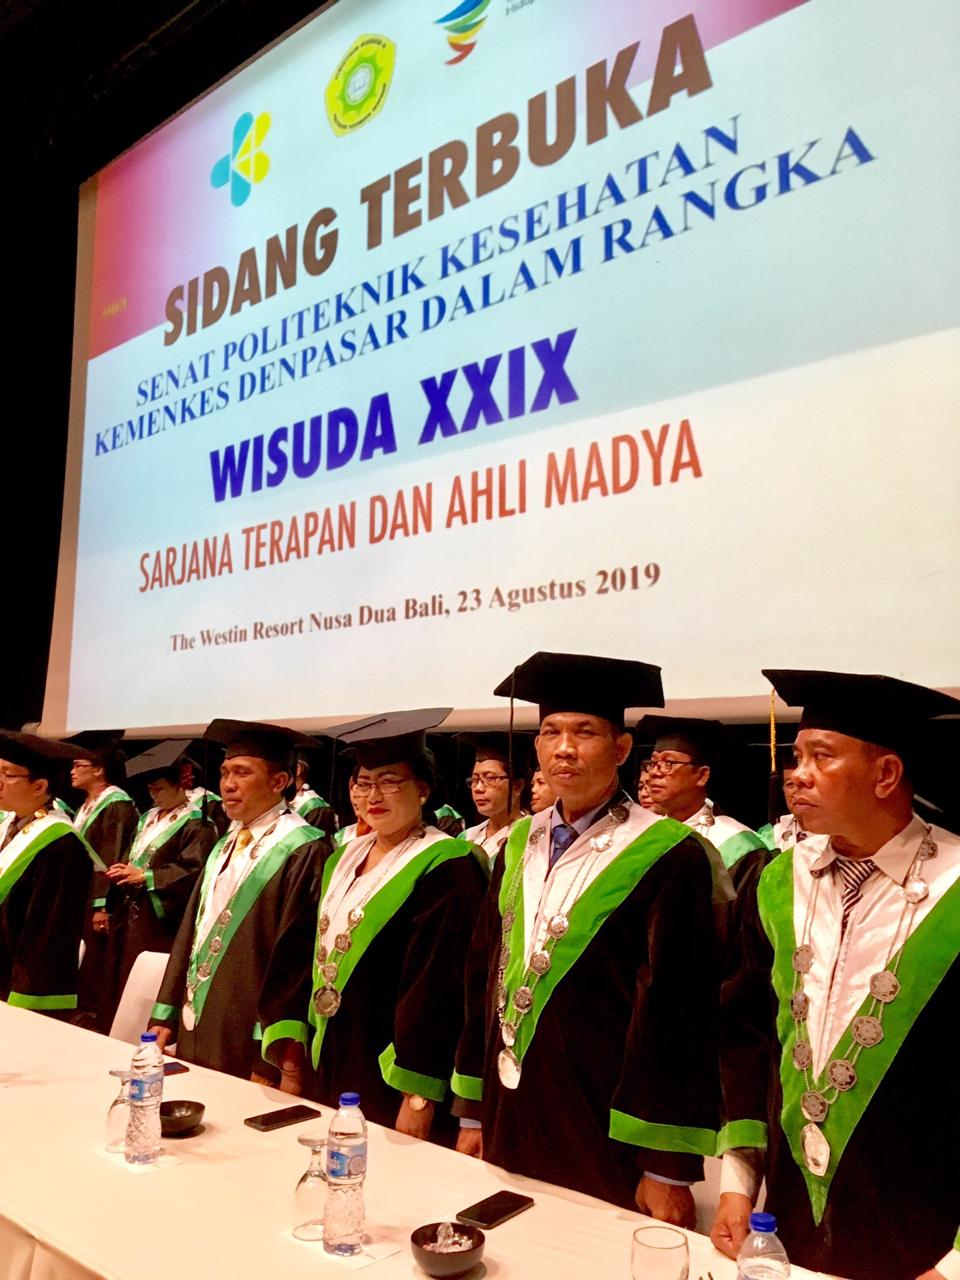 Wisuda XXIX Poltekkes Kemenkes Denpasar